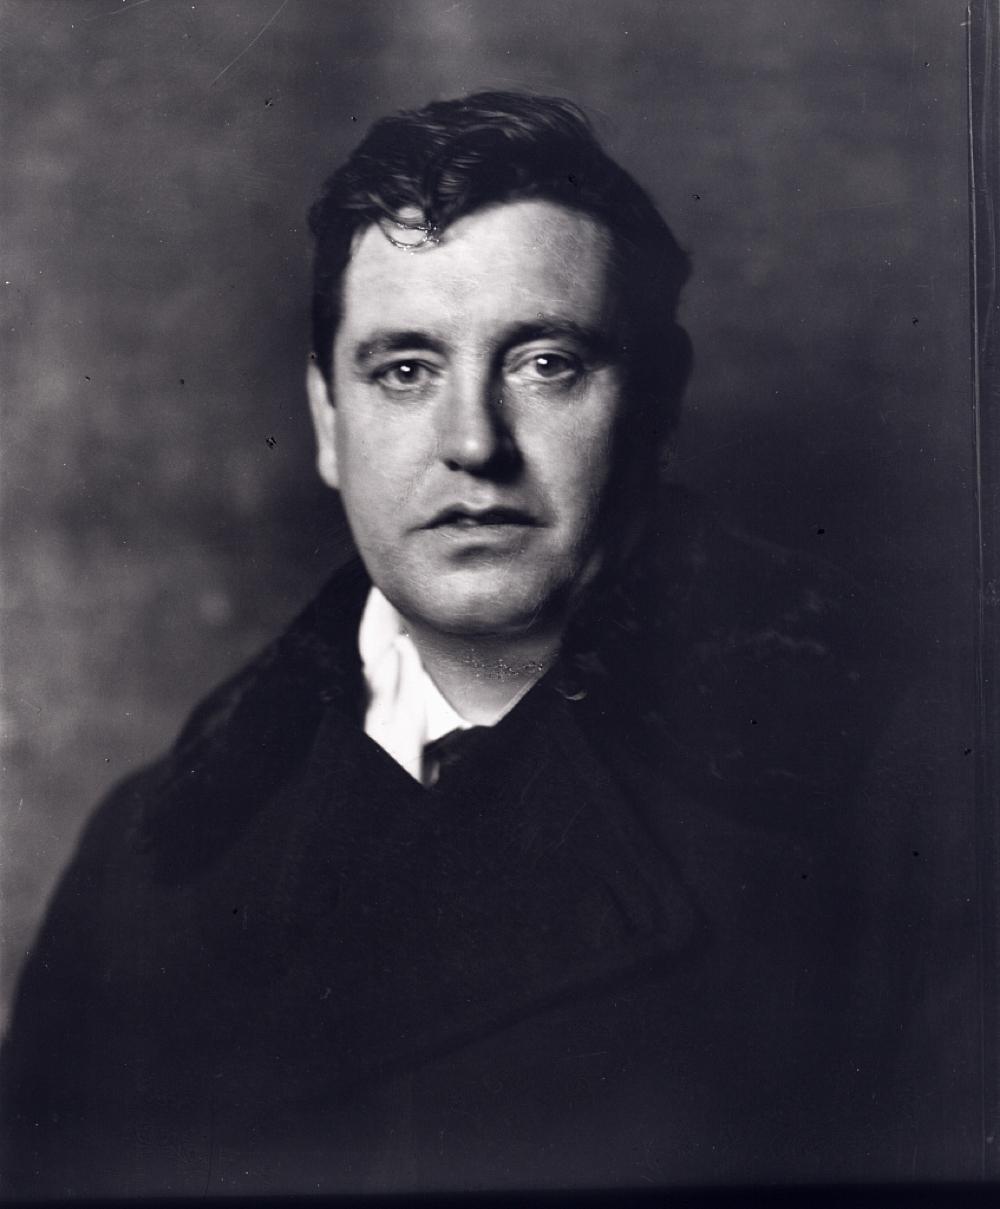 Portrait photograph of John McCormack